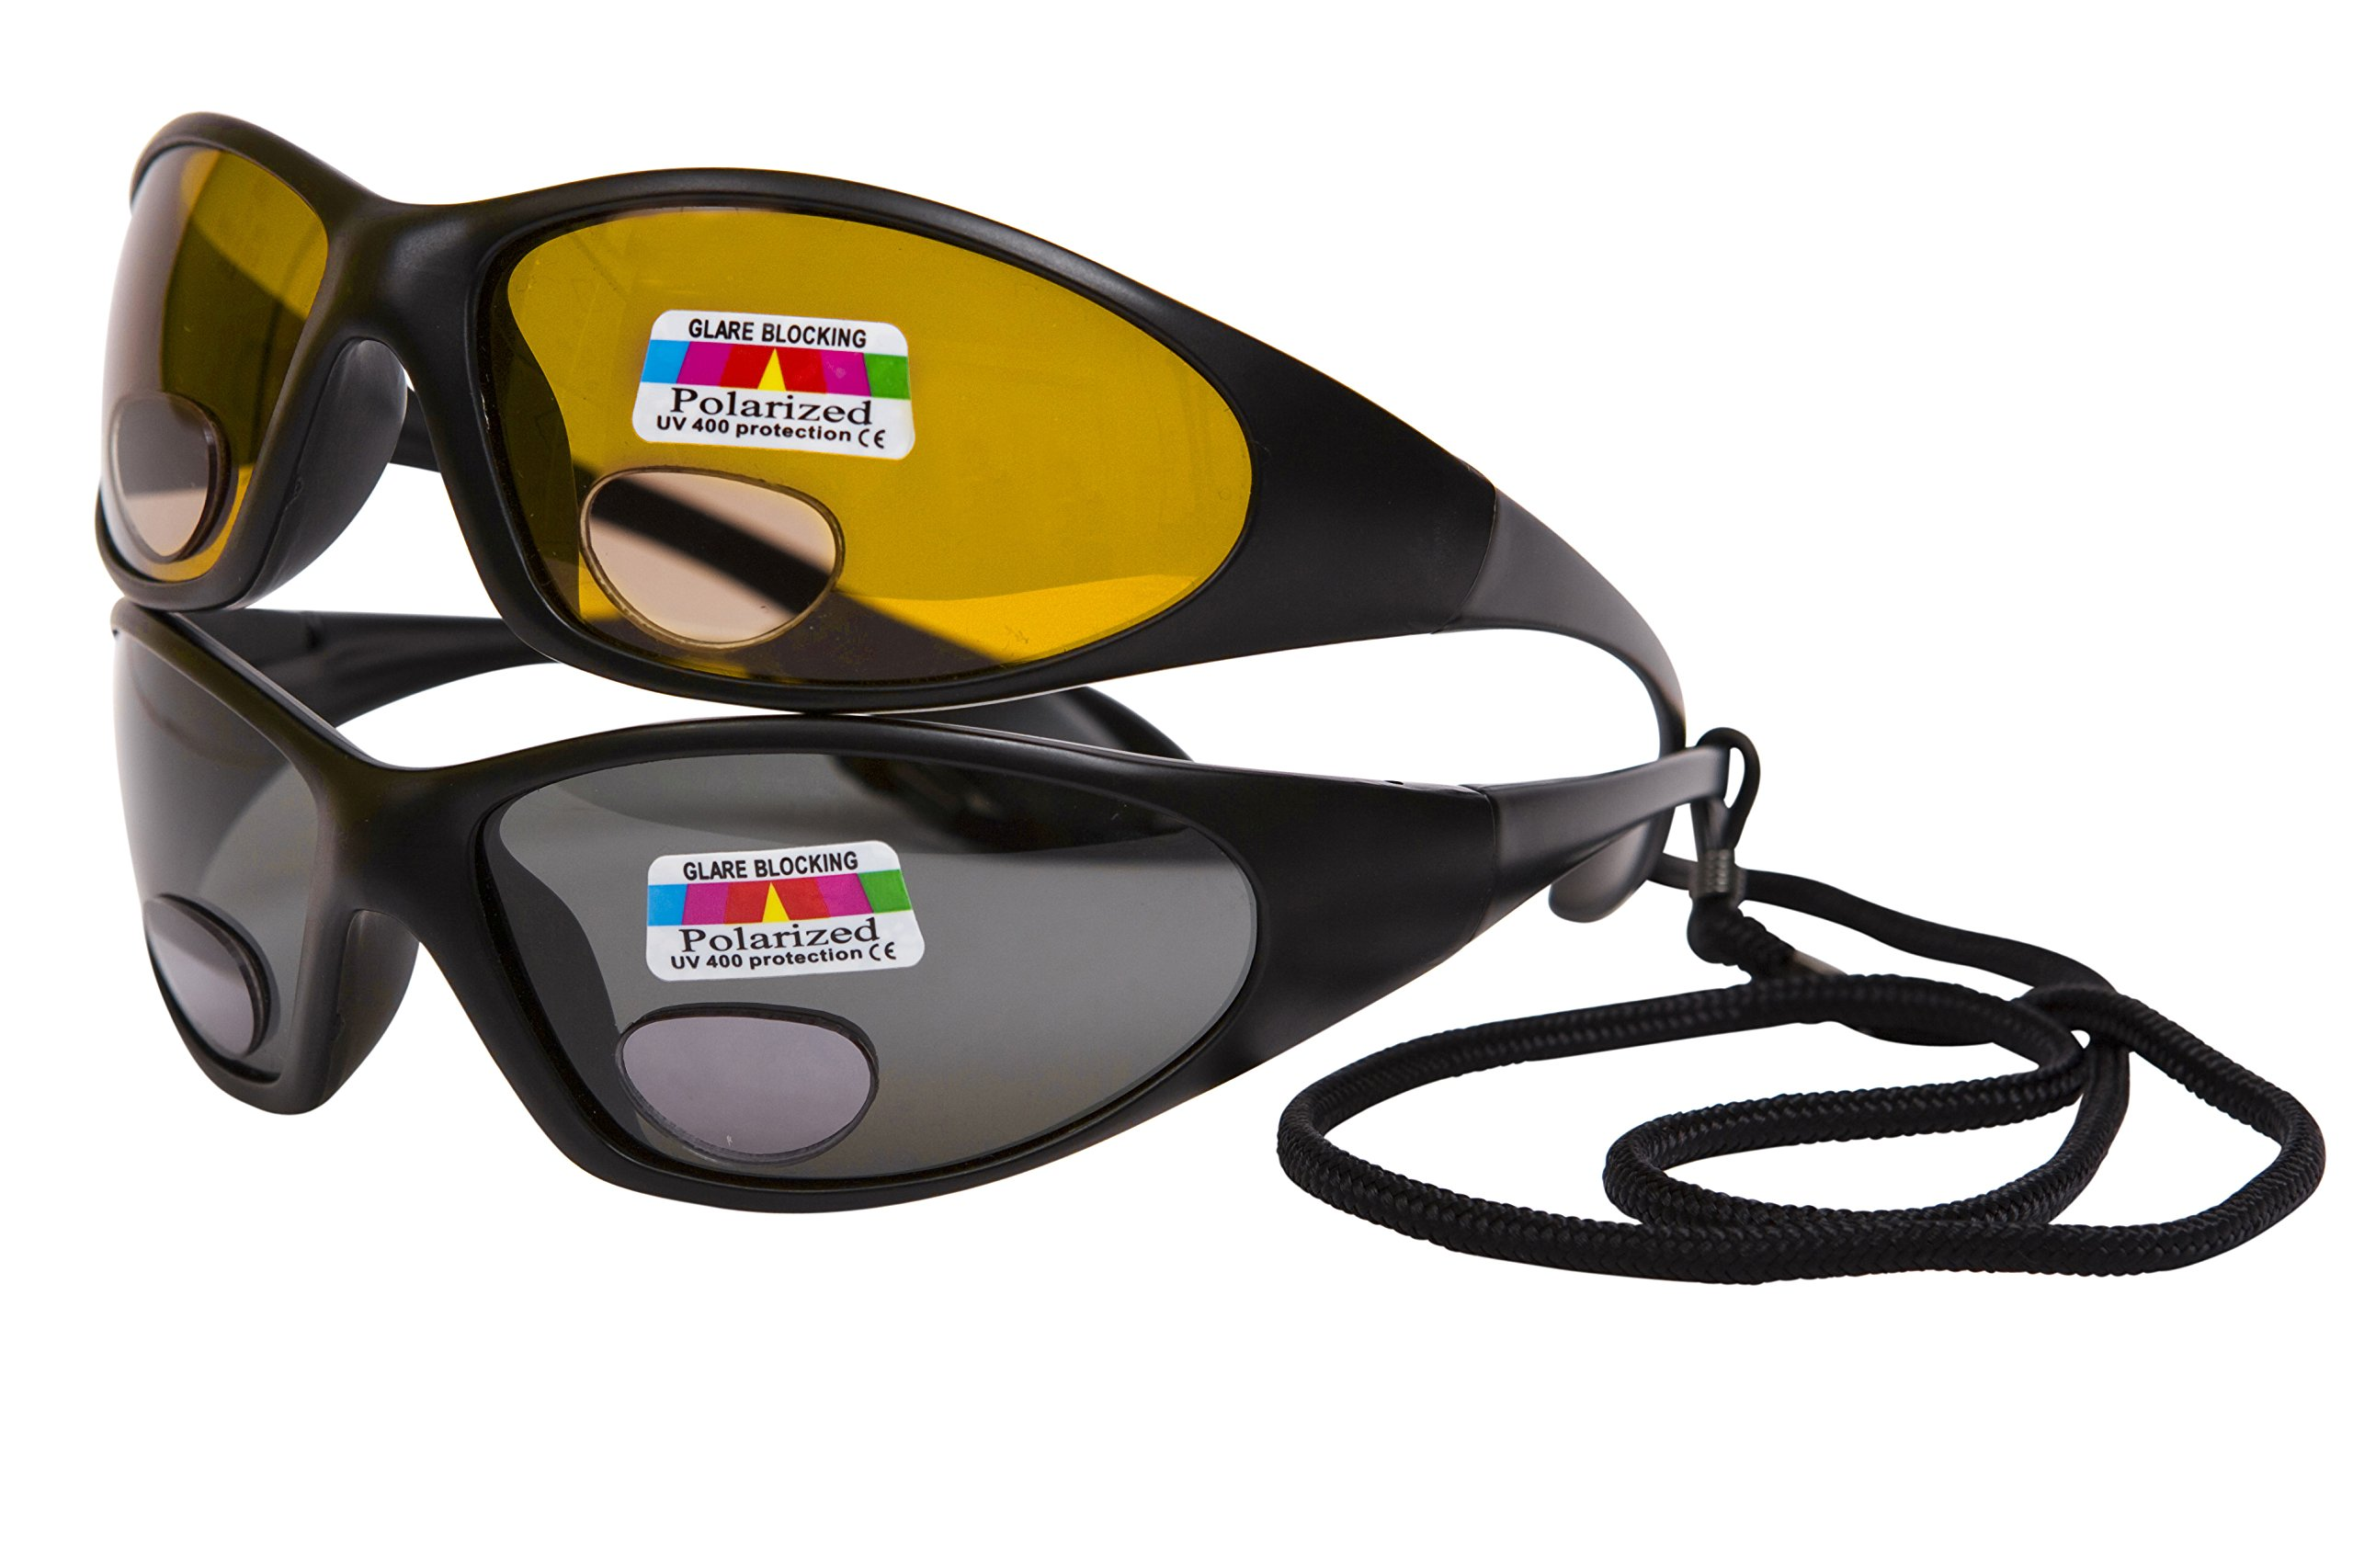 e7e4c07698 2 pairs Polarised fishing glasses with bifocal lenses +2.50 - One pair grey  lenses for